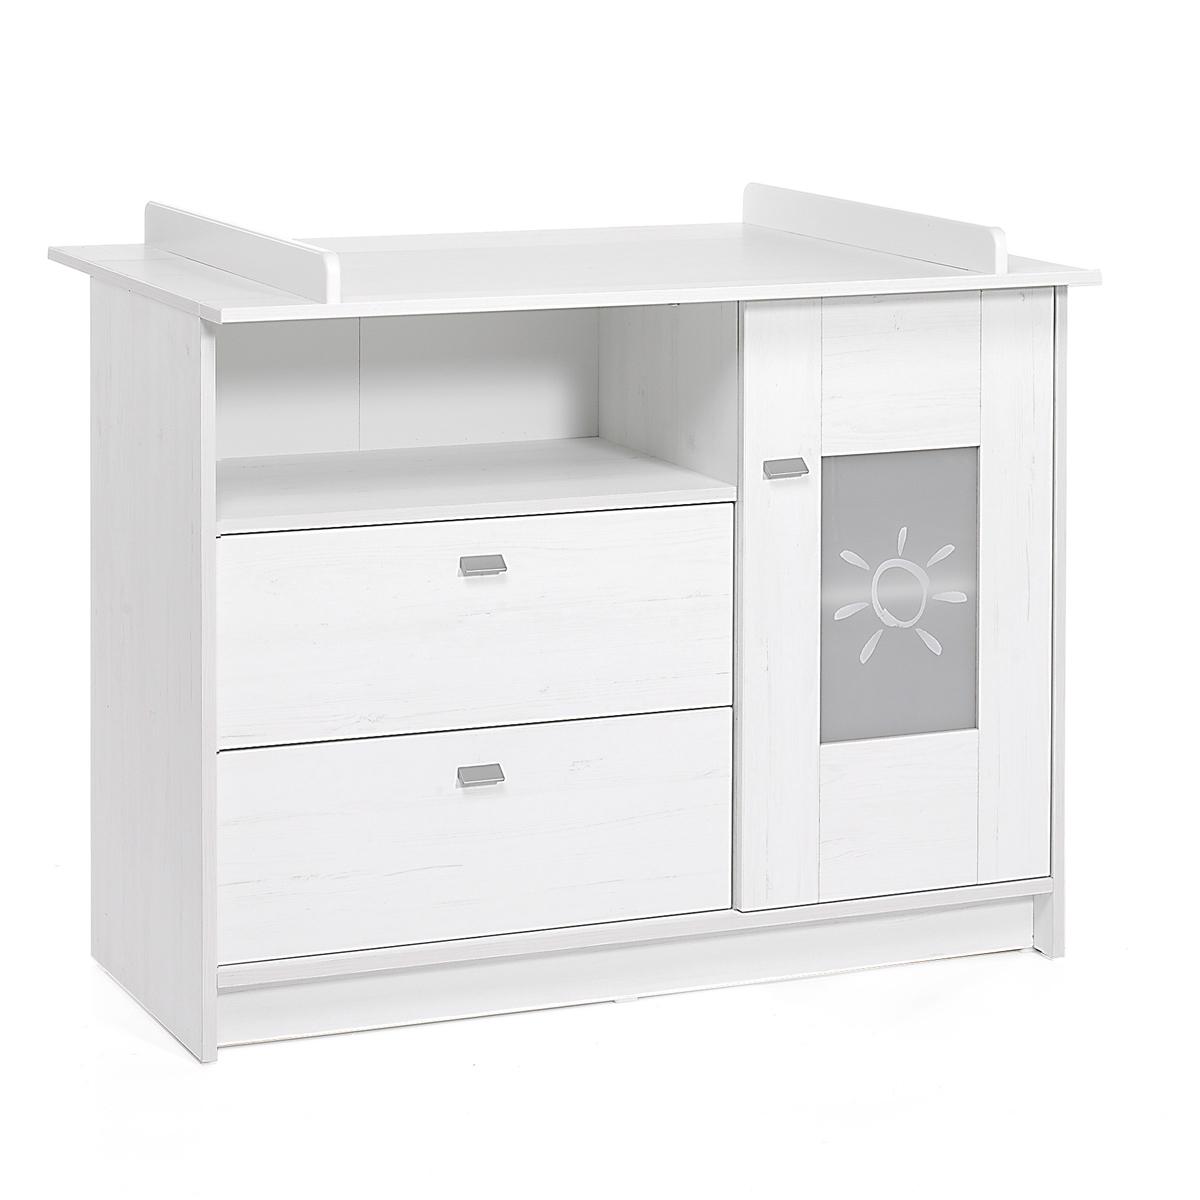 commode avec plan langer collection sol 1188wk achat vente commode sur. Black Bedroom Furniture Sets. Home Design Ideas